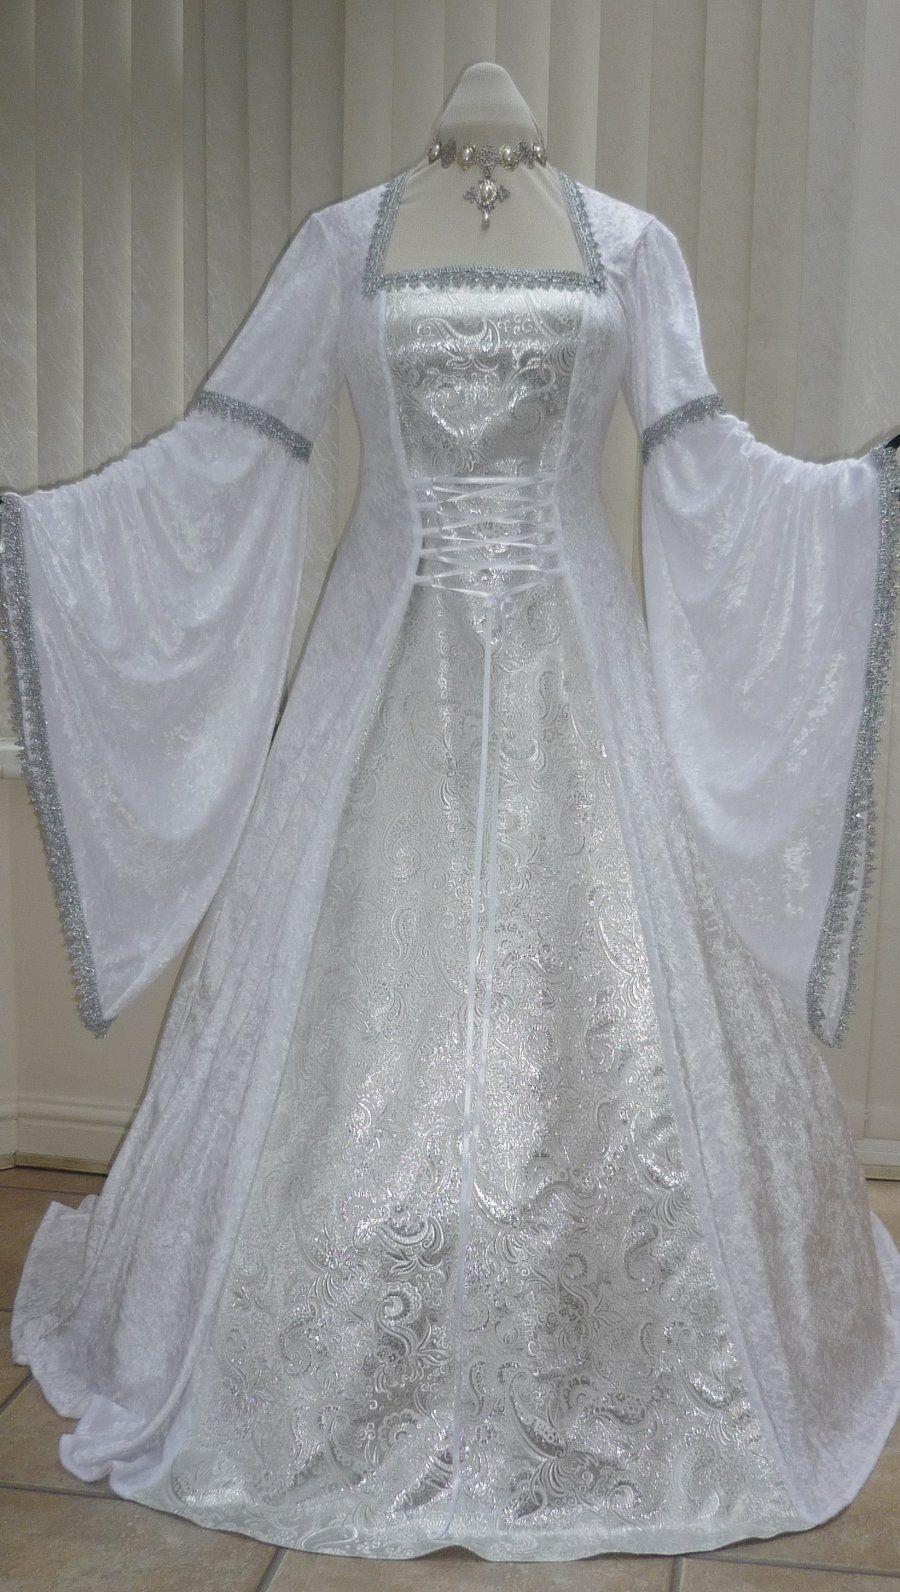 White and Silver Medieval Renaissance Pagan Wedding Dress, Dawns ...